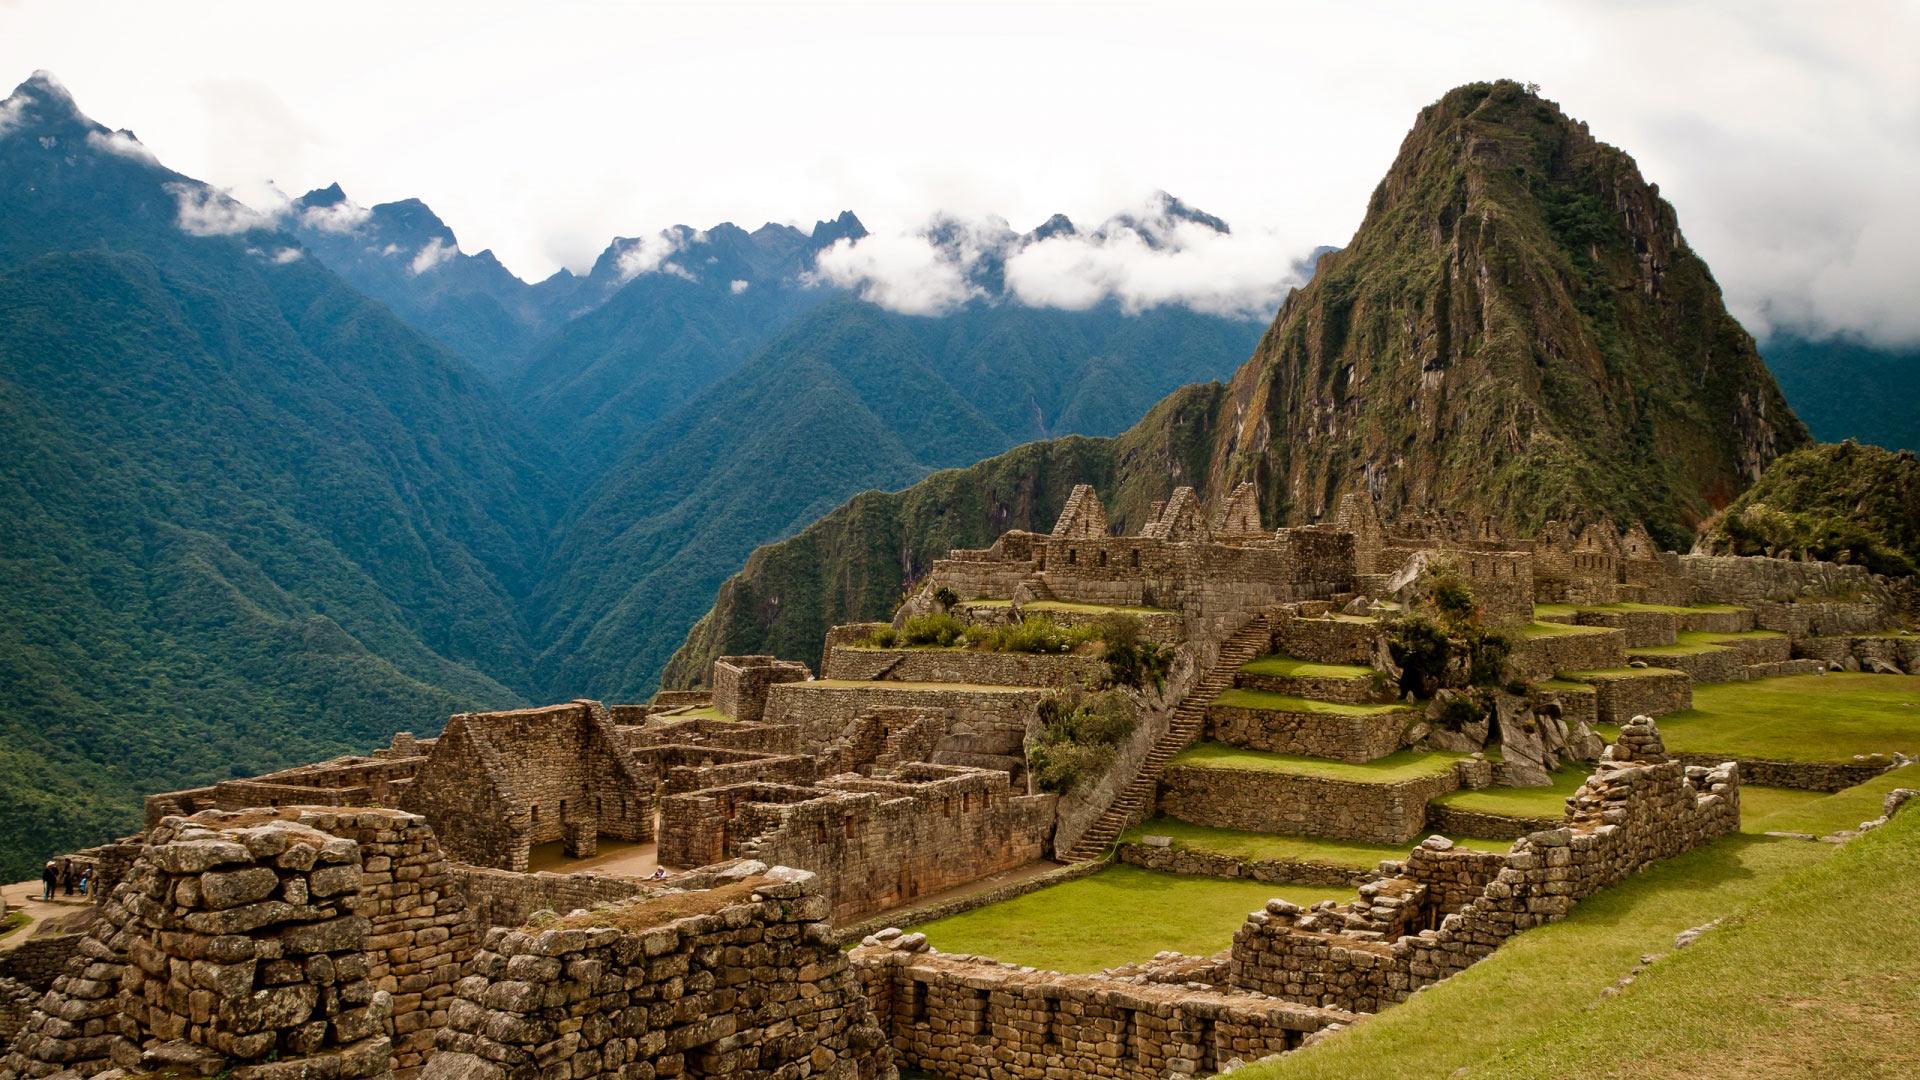 Мачу пикчу — город древней америки